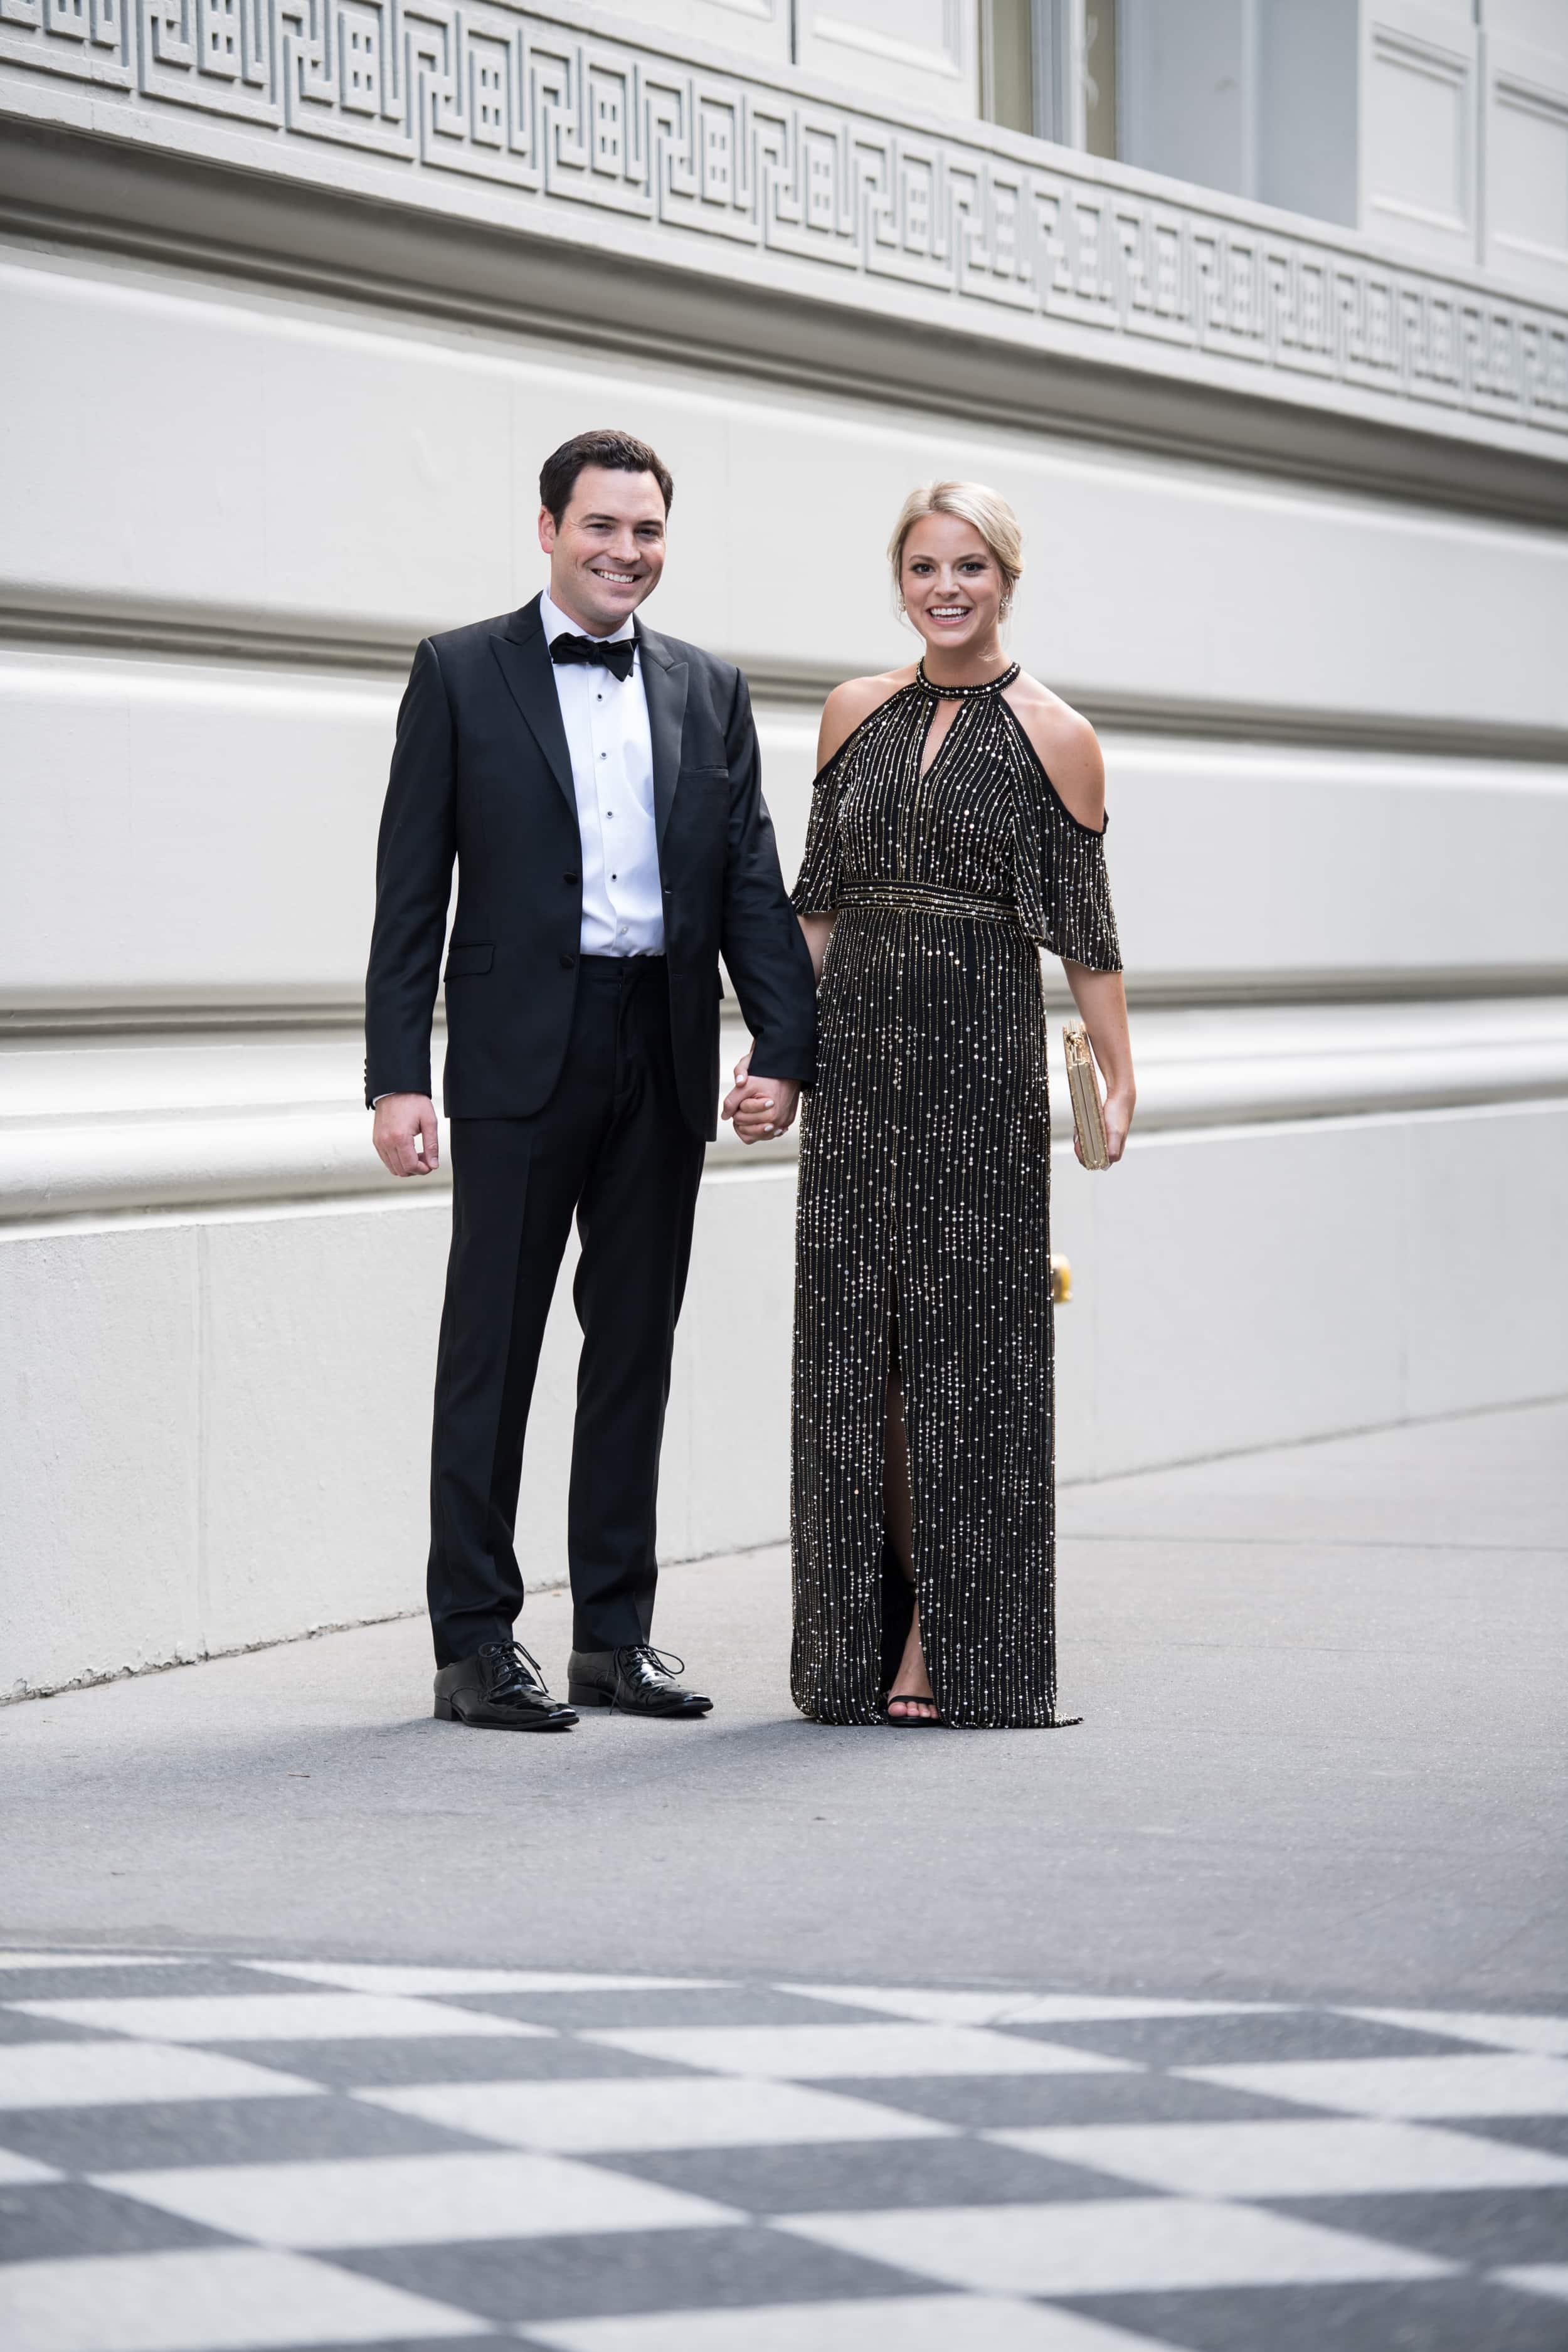 8b751c1760 Black Tie Wedding Attire - Styled Snapshots